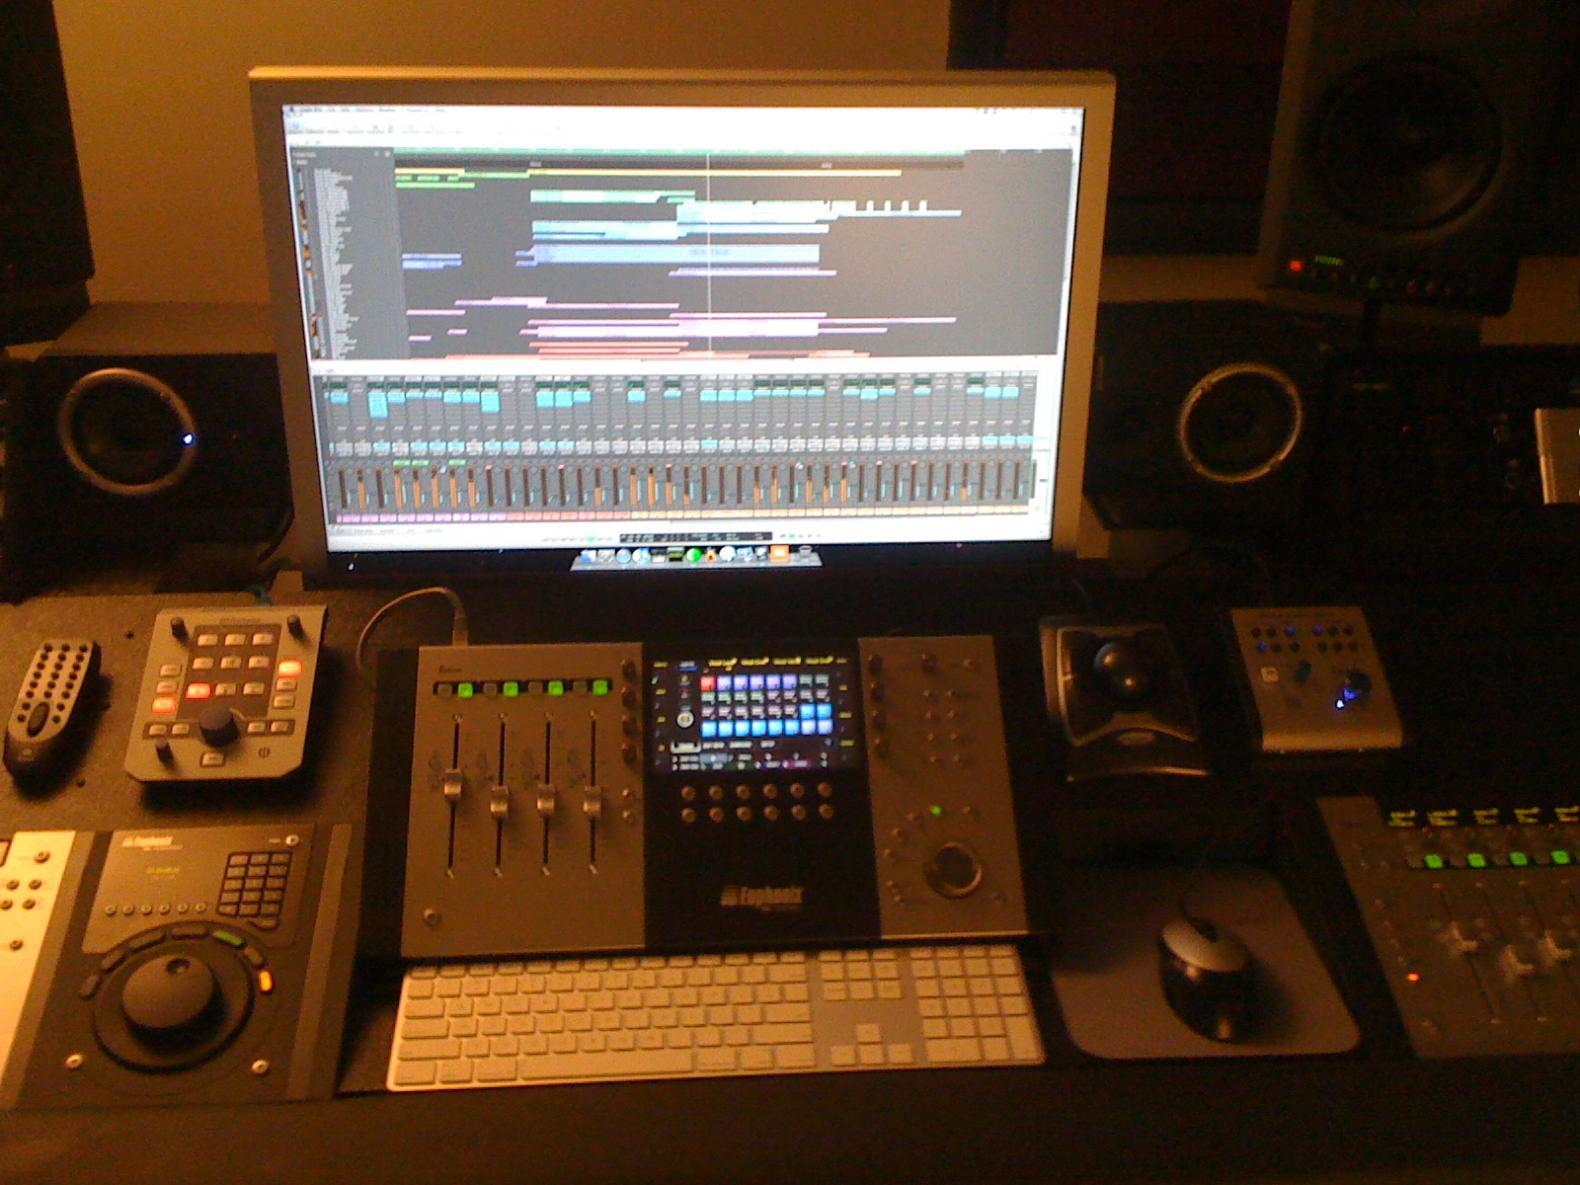 building a poor 39 s man euphonix system 5 mc w pics page 6 gearslutz pro audio community. Black Bedroom Furniture Sets. Home Design Ideas